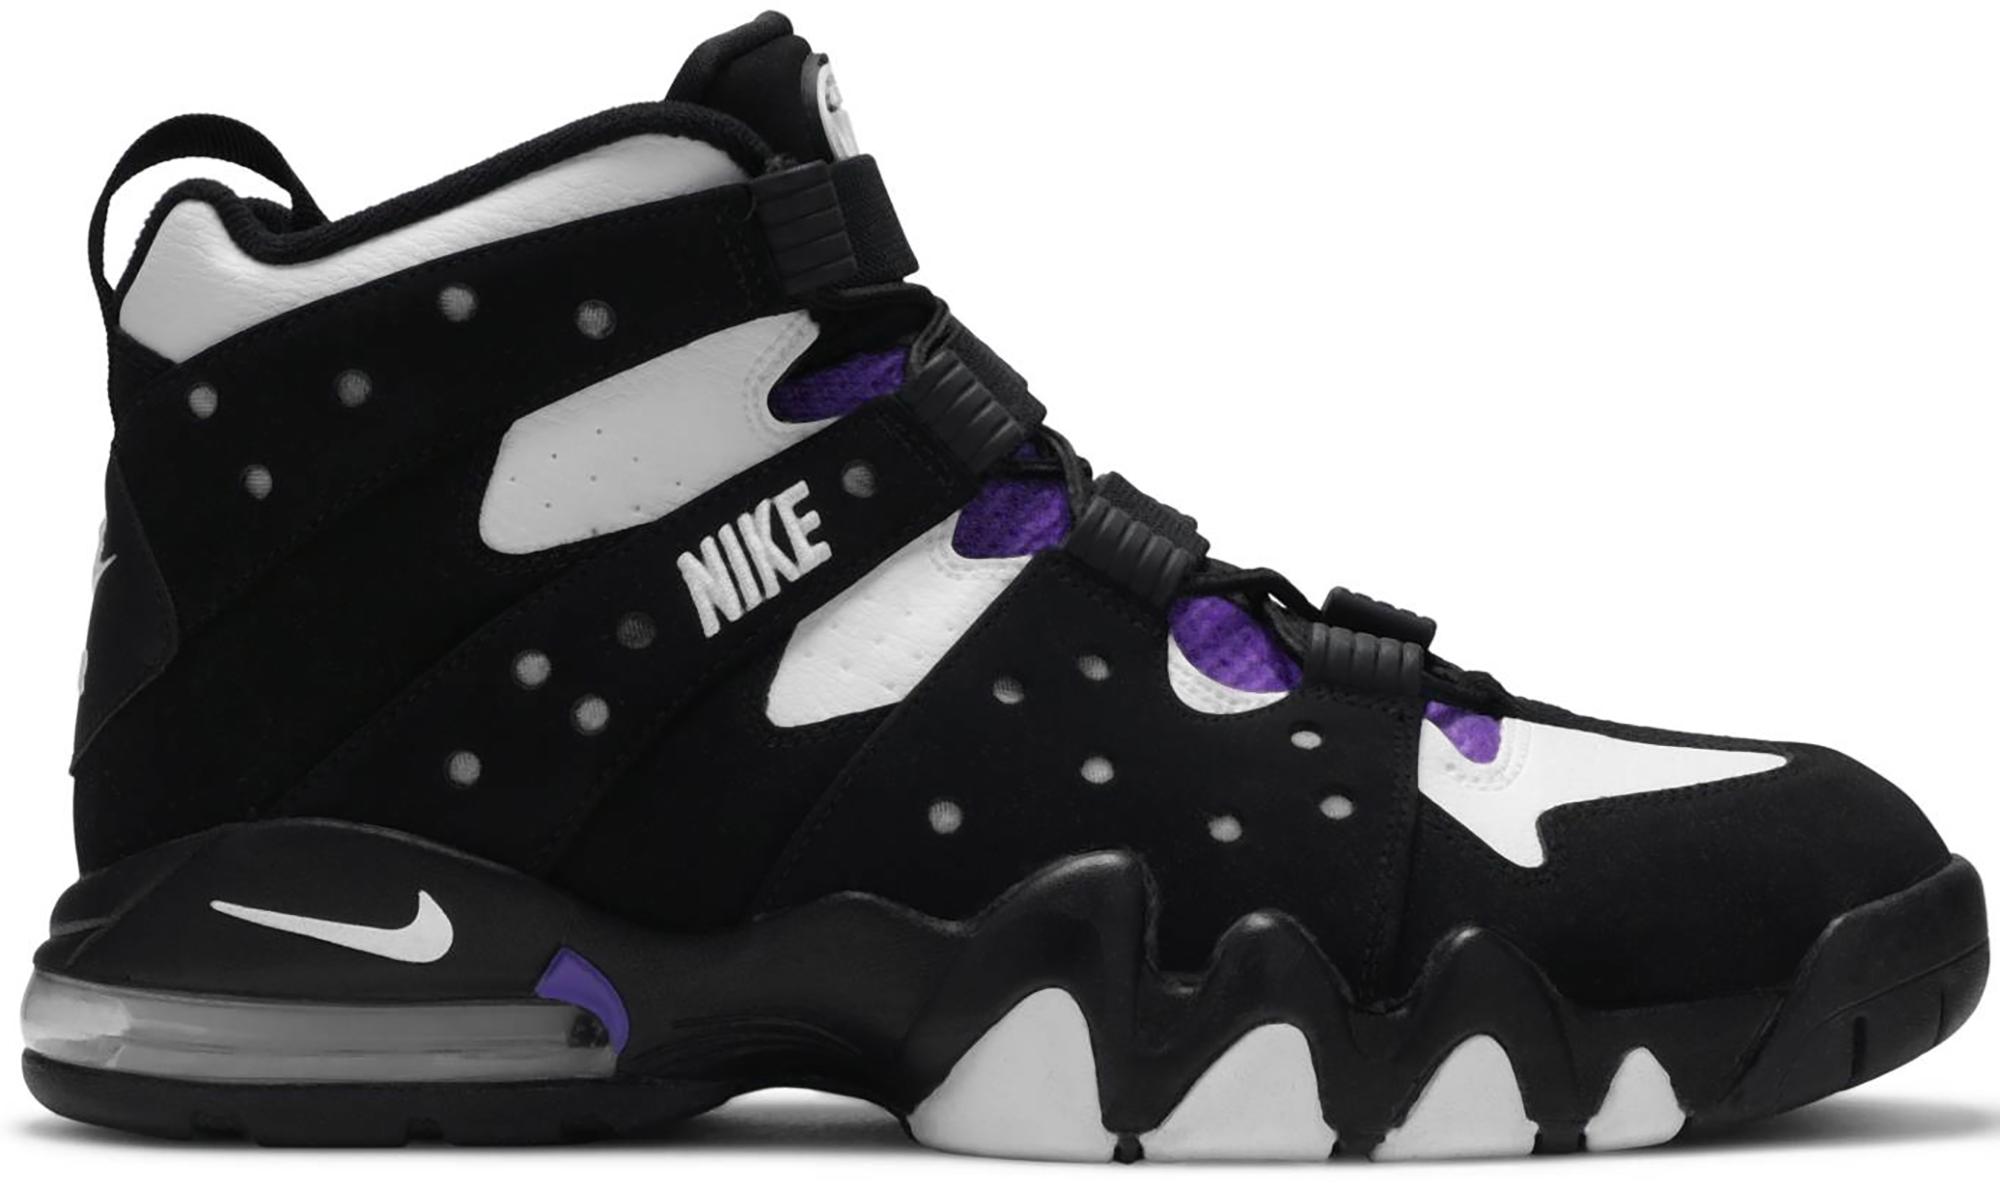 Nike Air Max 2 CB 94 Black White Purple